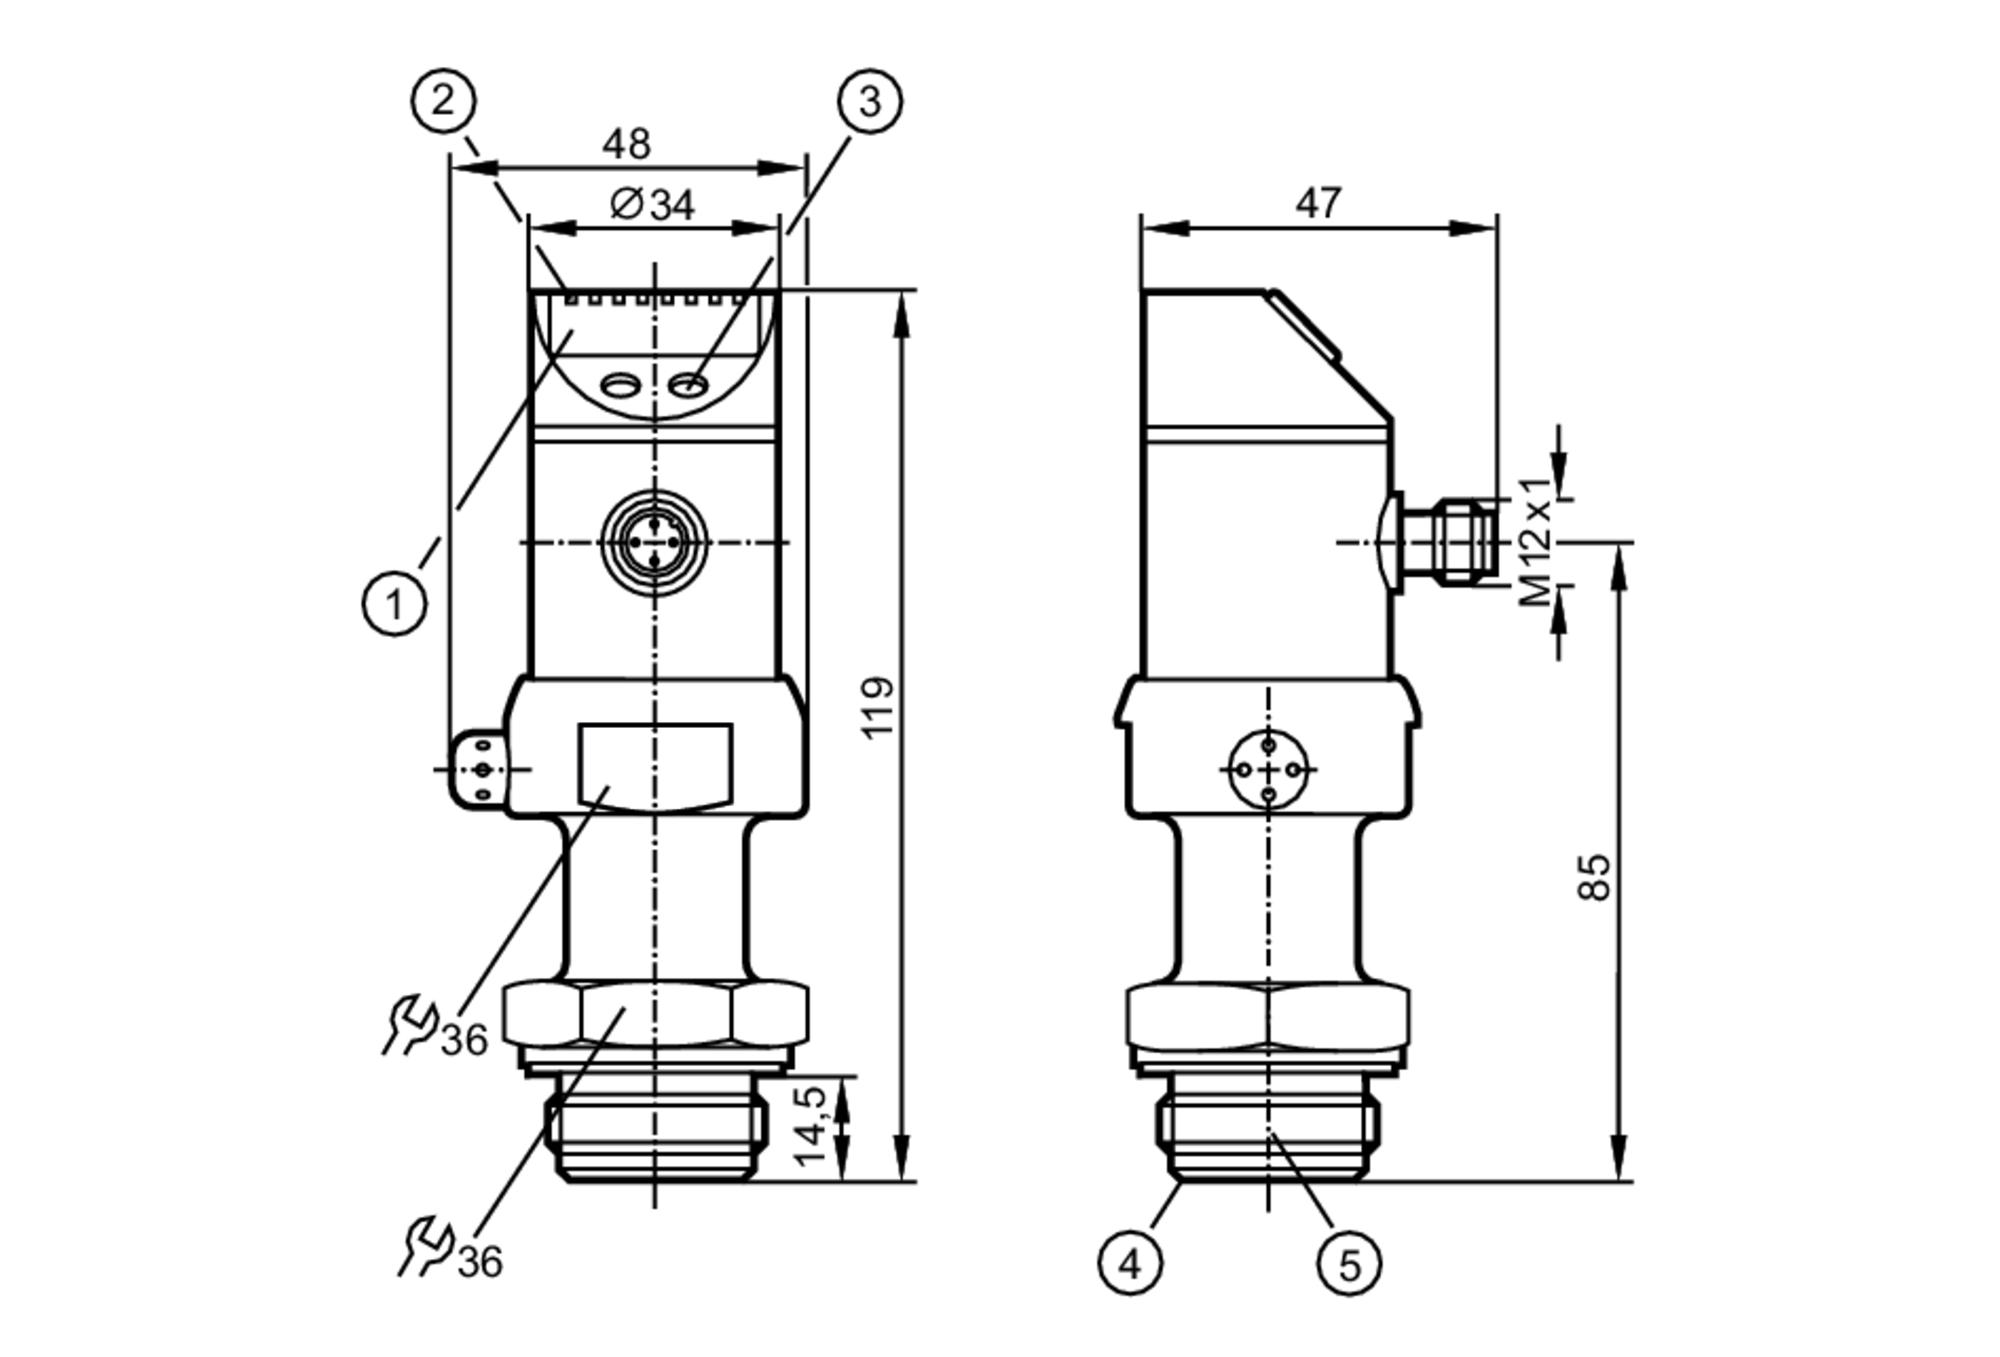 pi2096 - flush pressure sensor with display